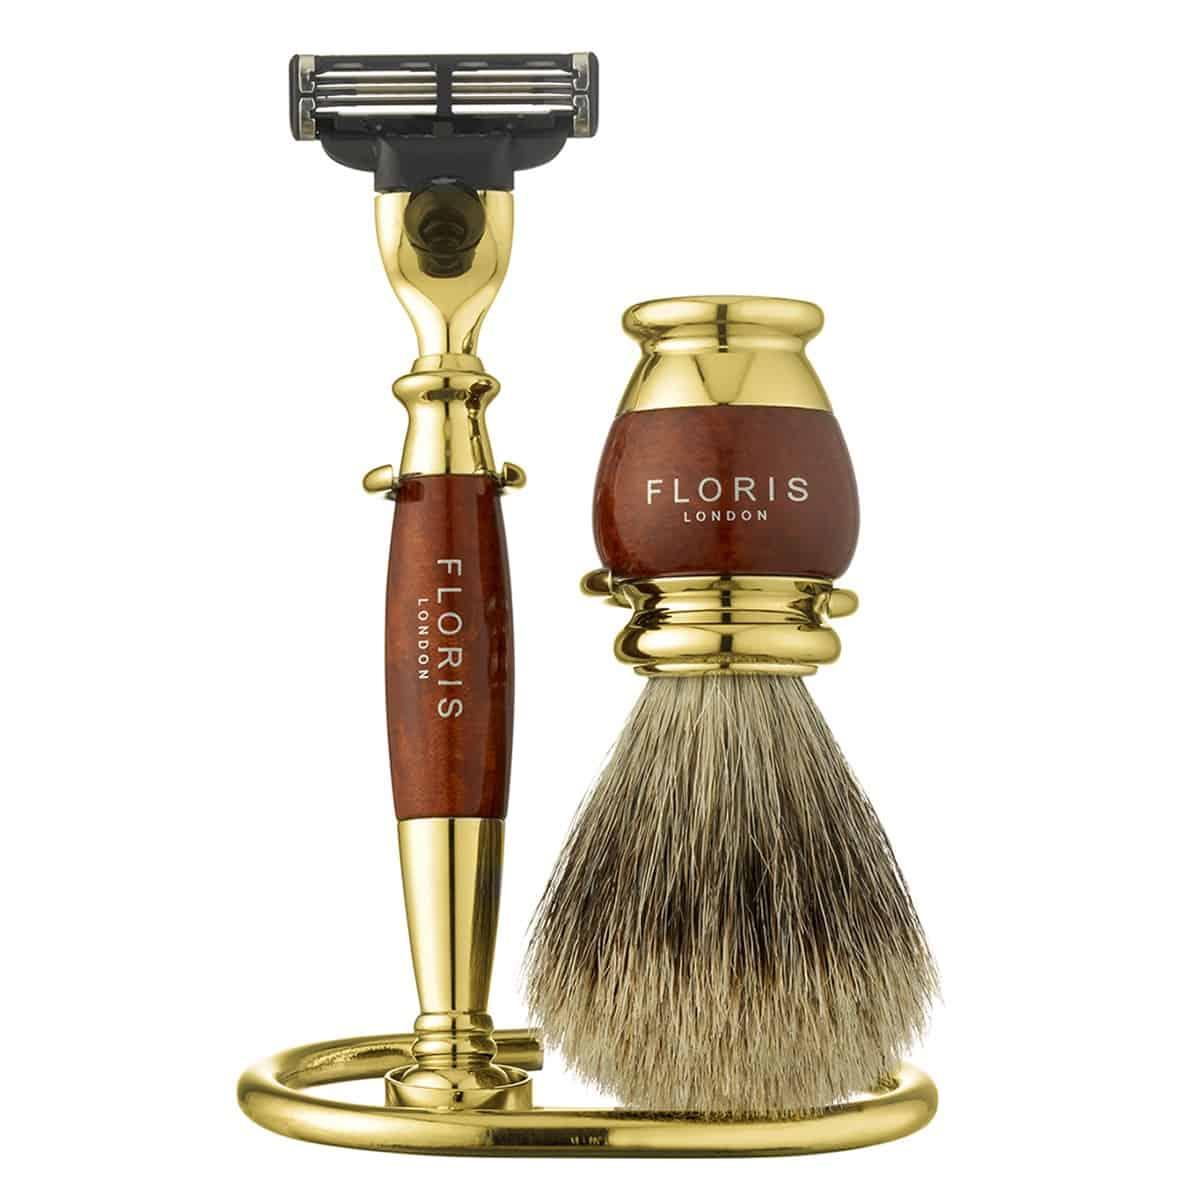 Floris London barbersæt